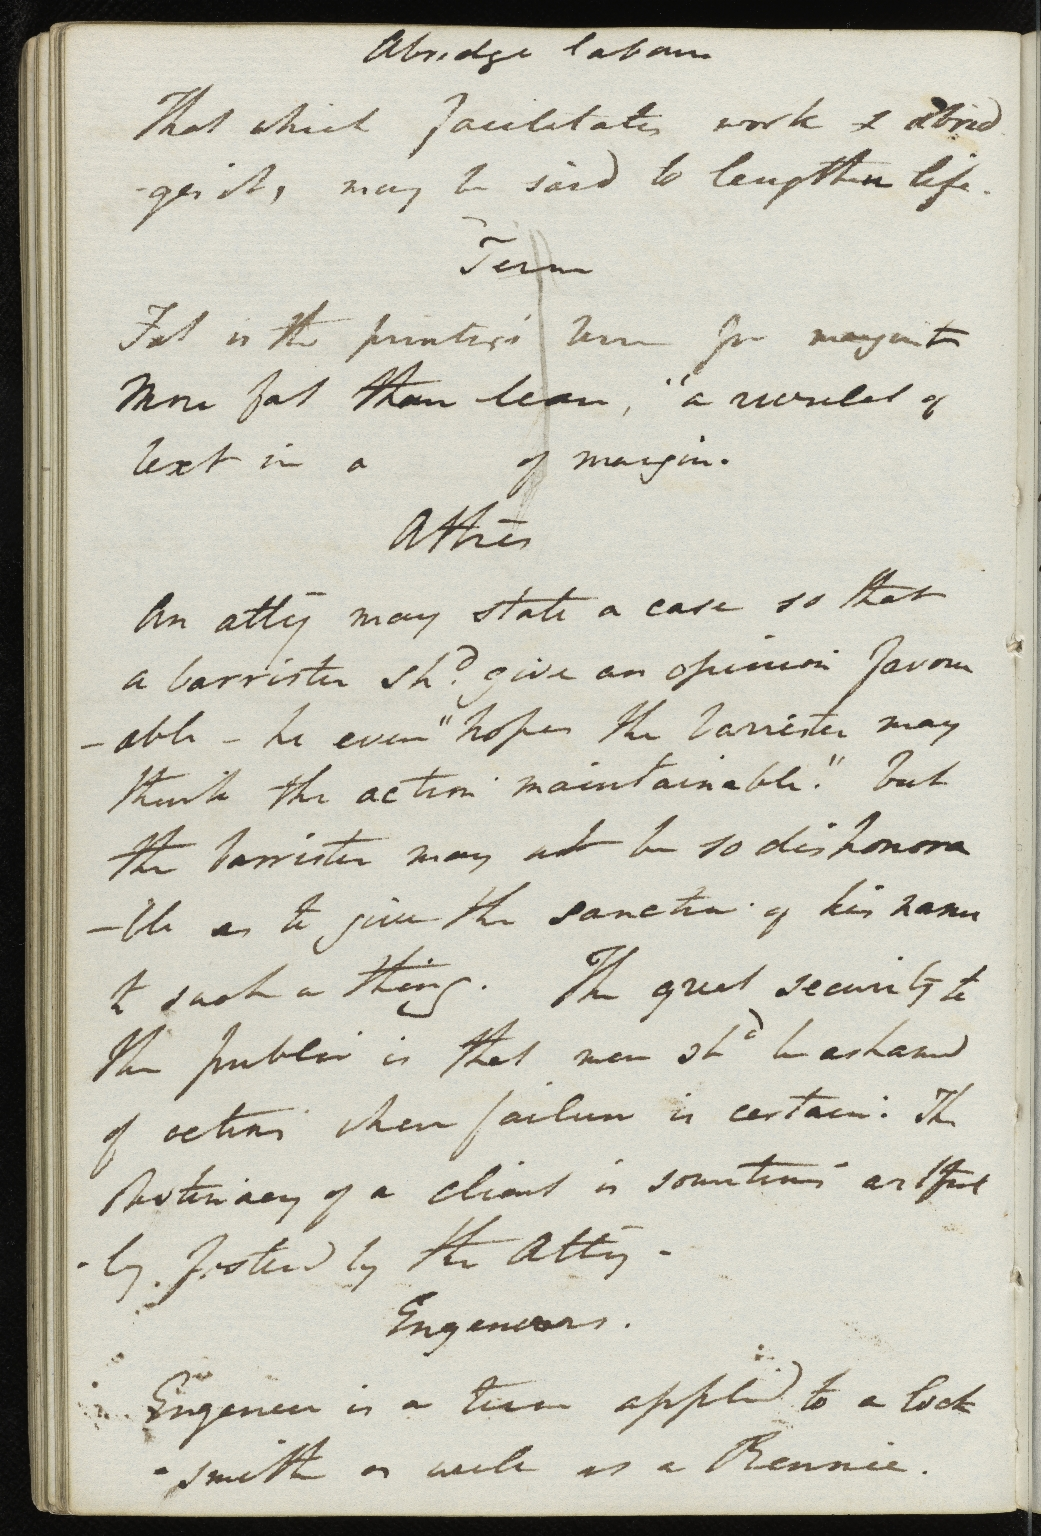 Notebook No. 4, p.108